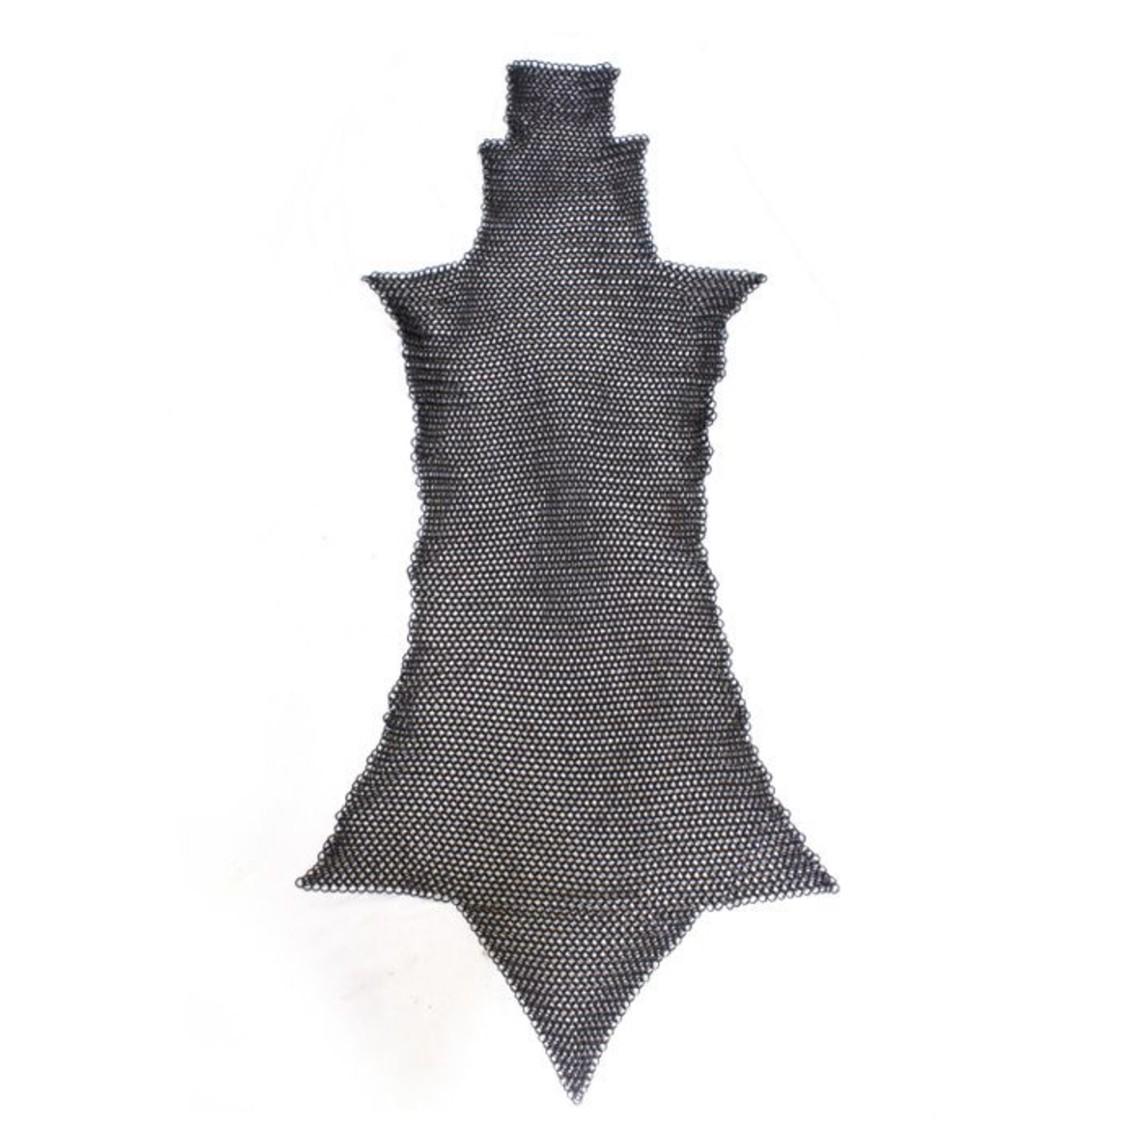 Maliënchausses, gebronsd, 8 mm